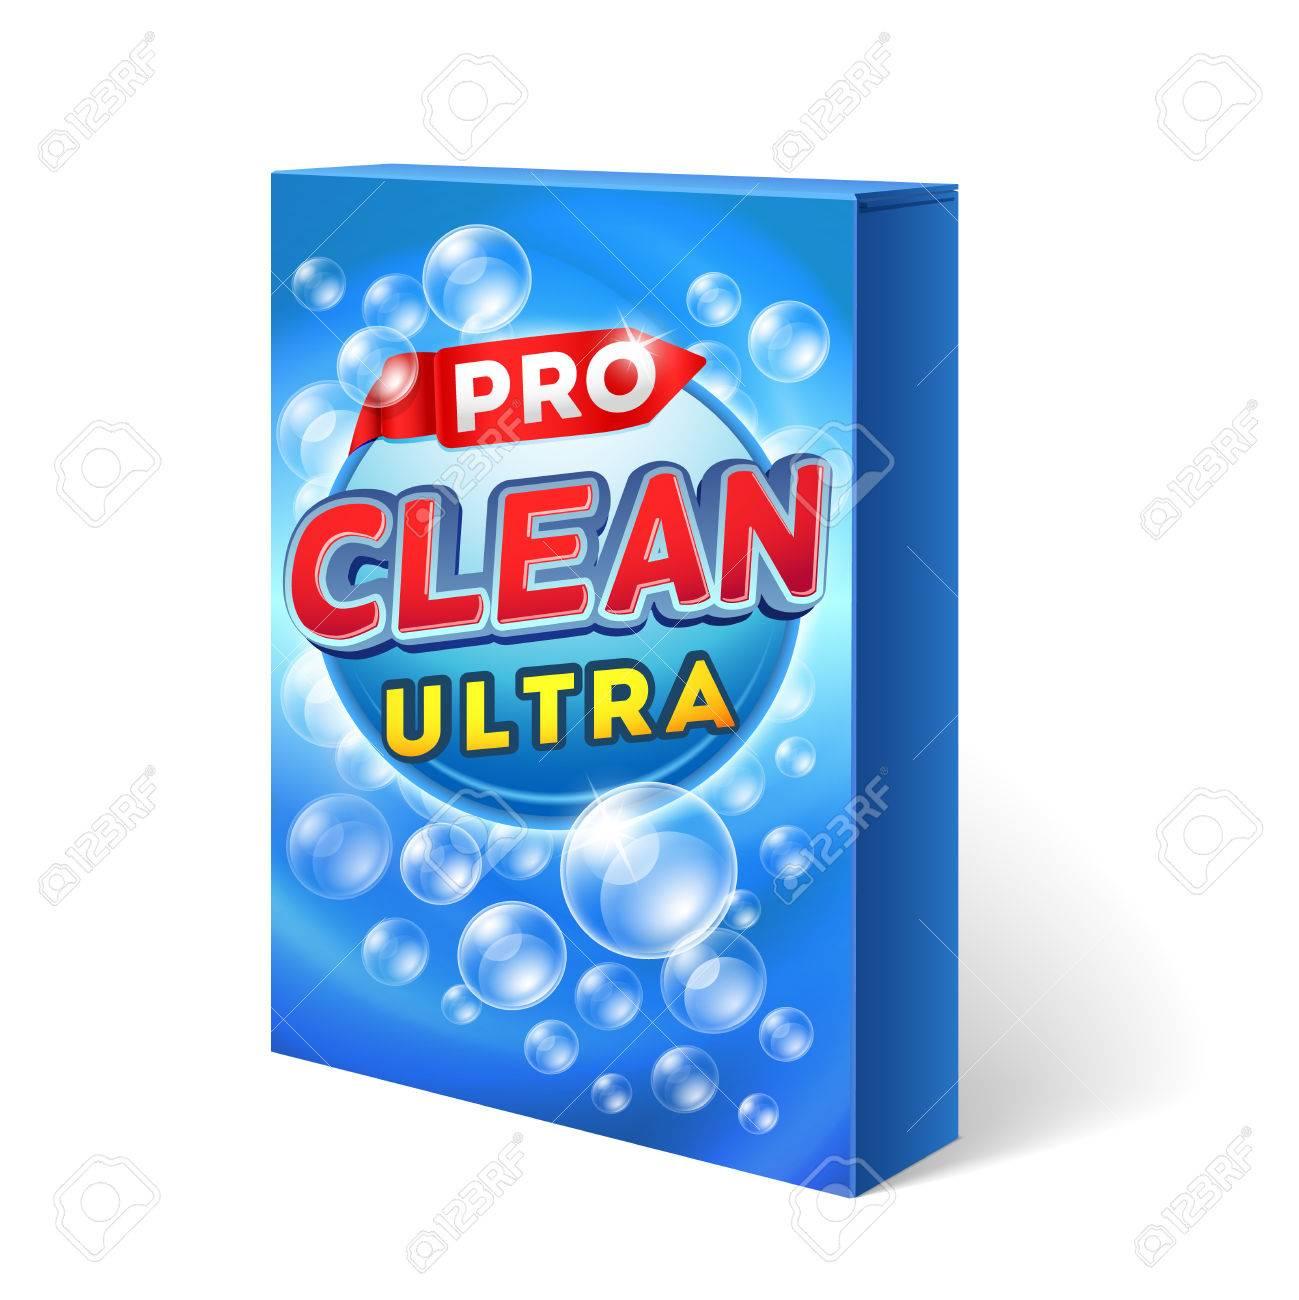 Powdered detergent design on cardboard package mockup. Powder washing chemical, packaging washing, bag, washing cleaning illustration - 55823257